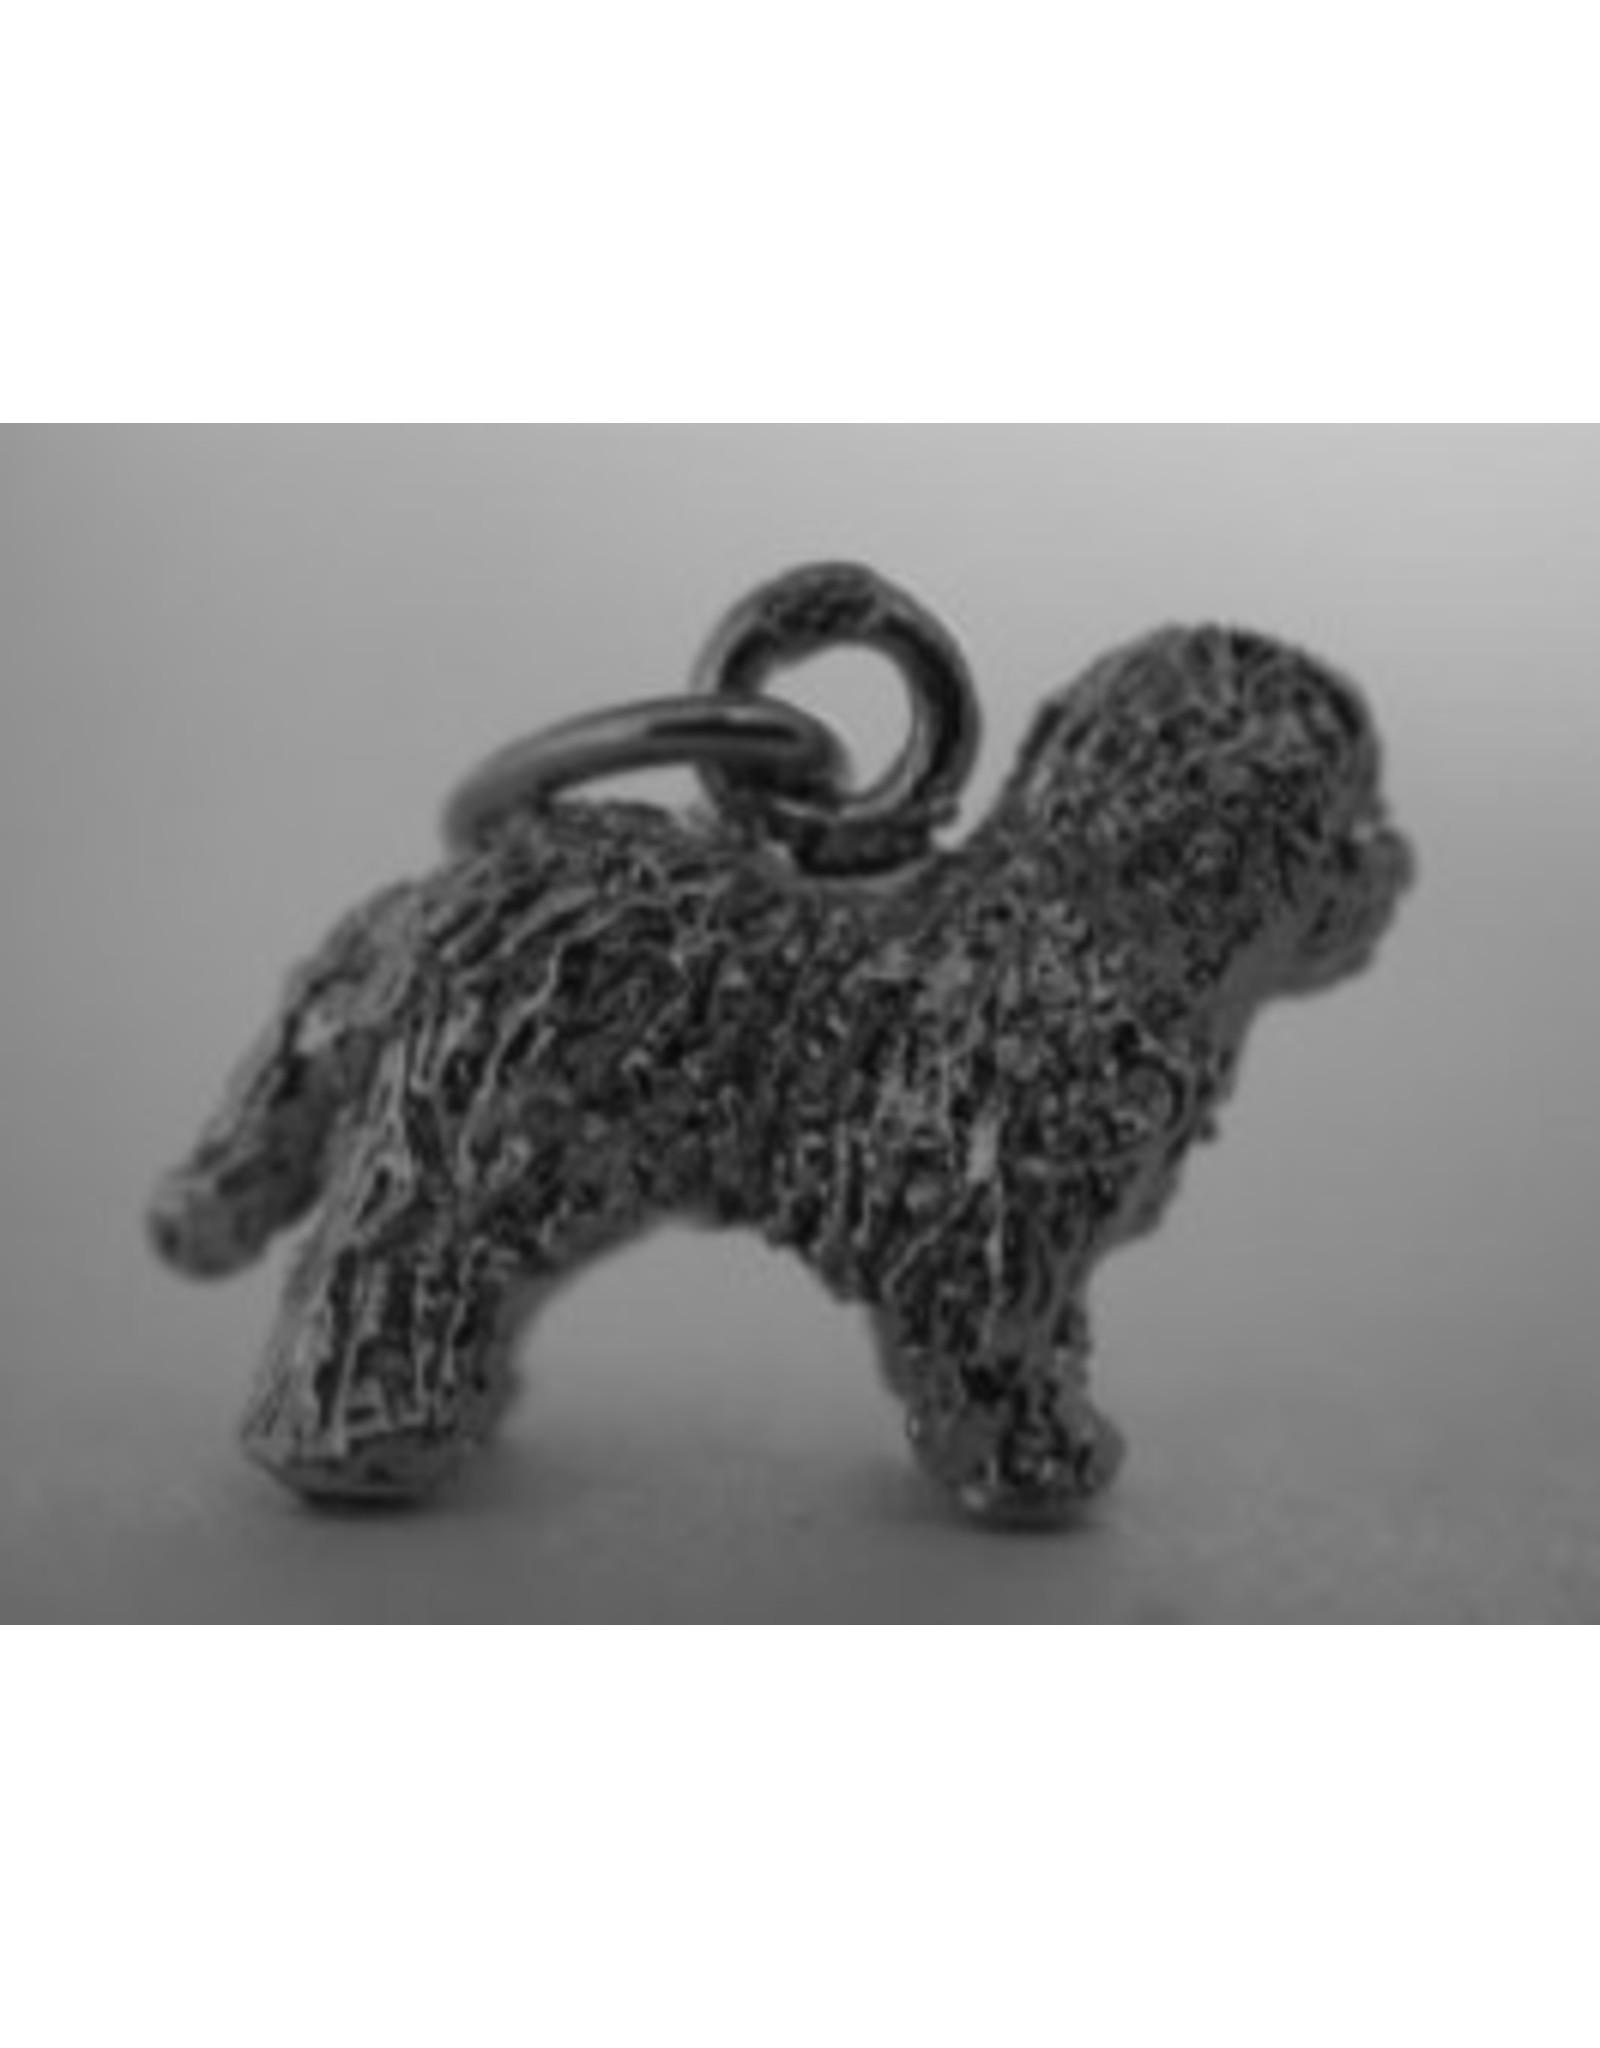 Handmade by Hanneke Weigel Sterling silver Old english sheepdog